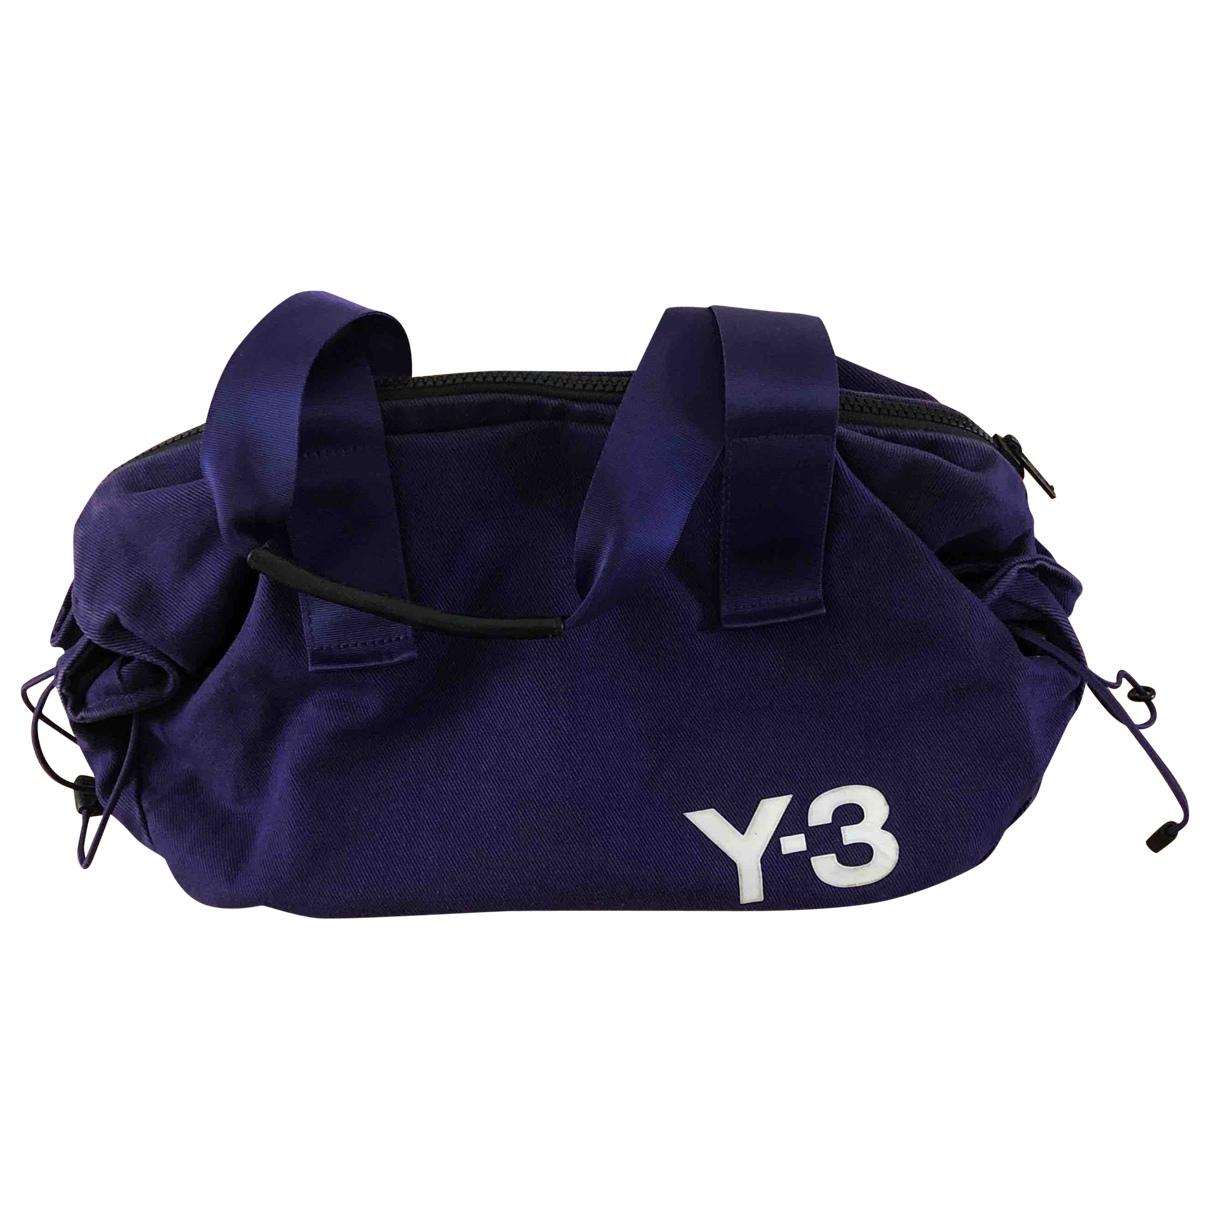 Y-3 By Yohji Yamamoto - Sac a main   pour femme en coton - violet